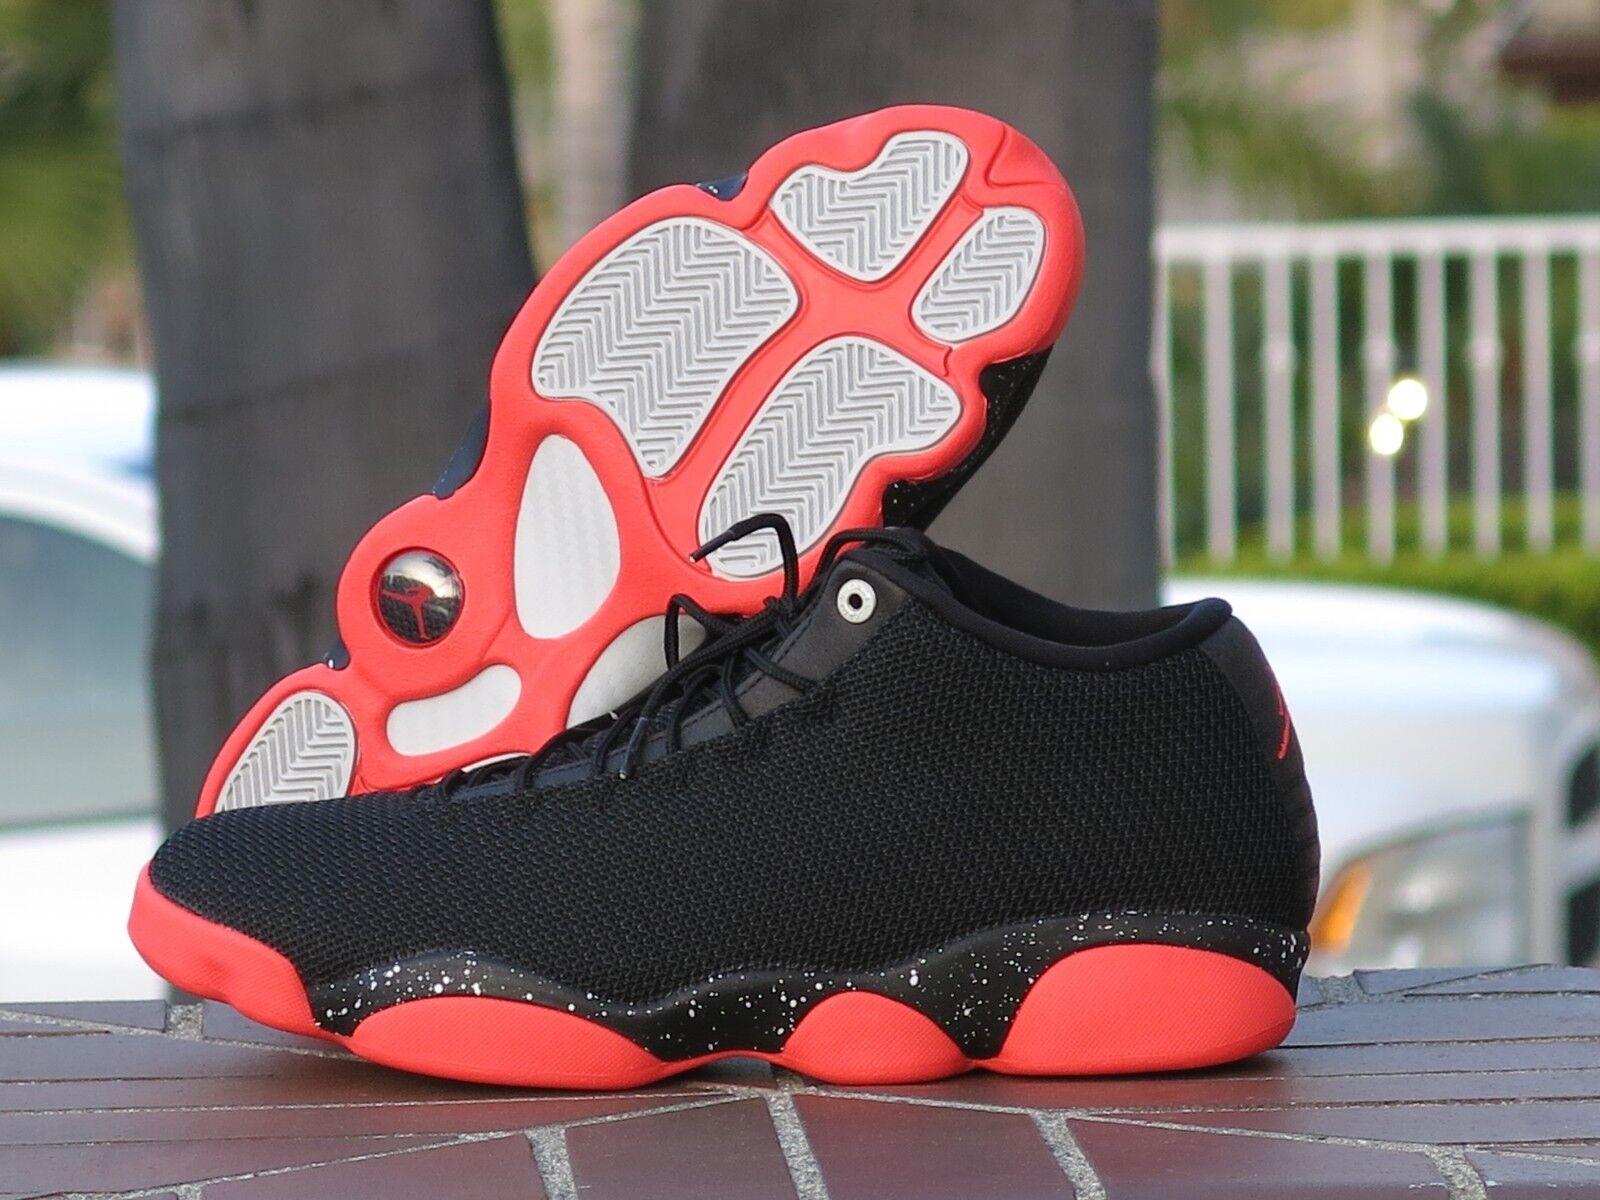 52434de7682 ... closeout nike jordan horizon low mens basketball basketball mens  sneakers 845098 060 sz 13 e73560 86929